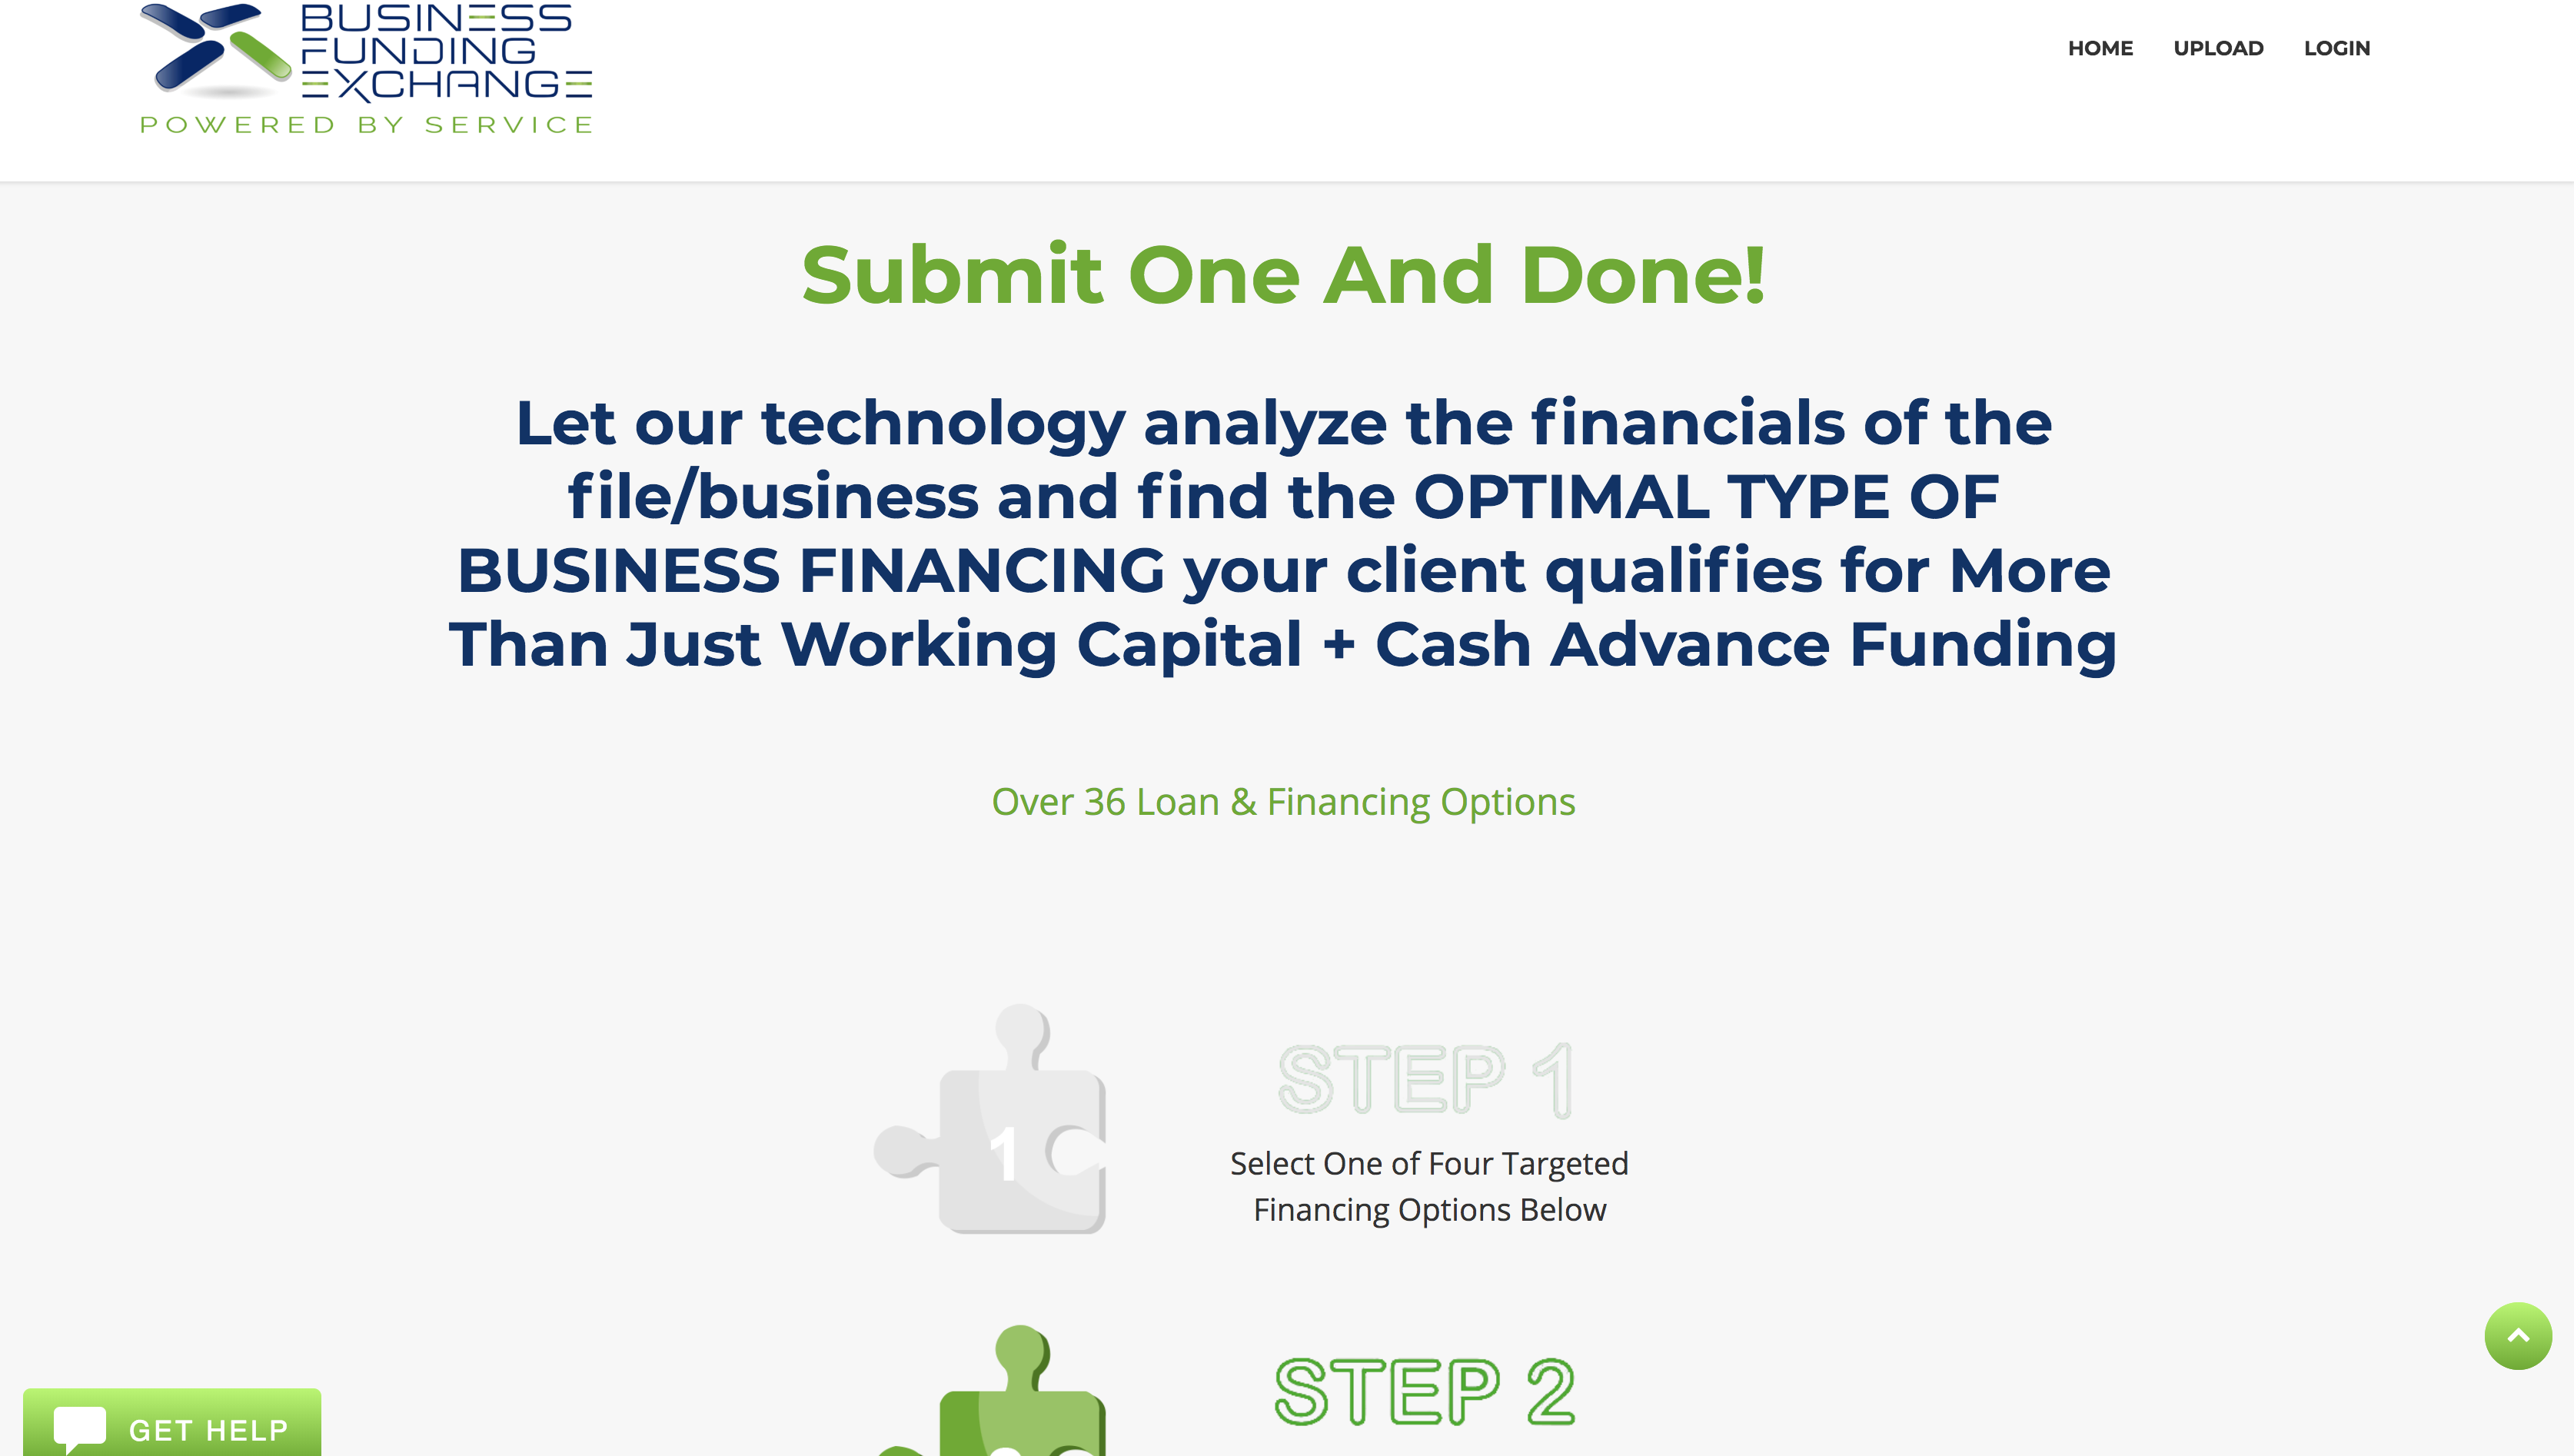 Business Funding Exchange Portal